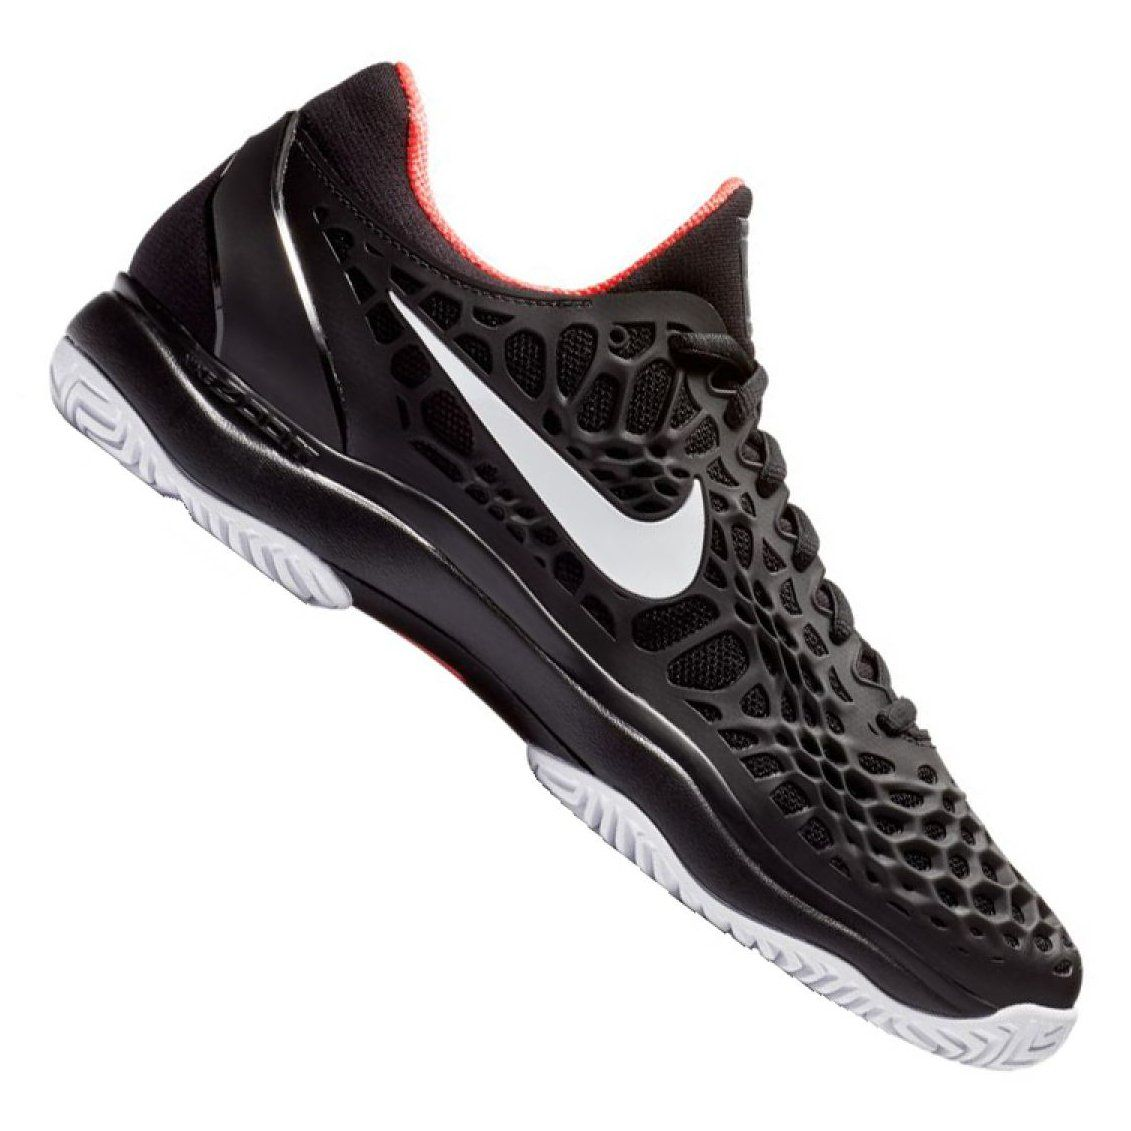 Buty Tenisowe Nike Air Zoom Cage 3 M 918193 026 Czarne Nike Nike Air Zoom Nike Air